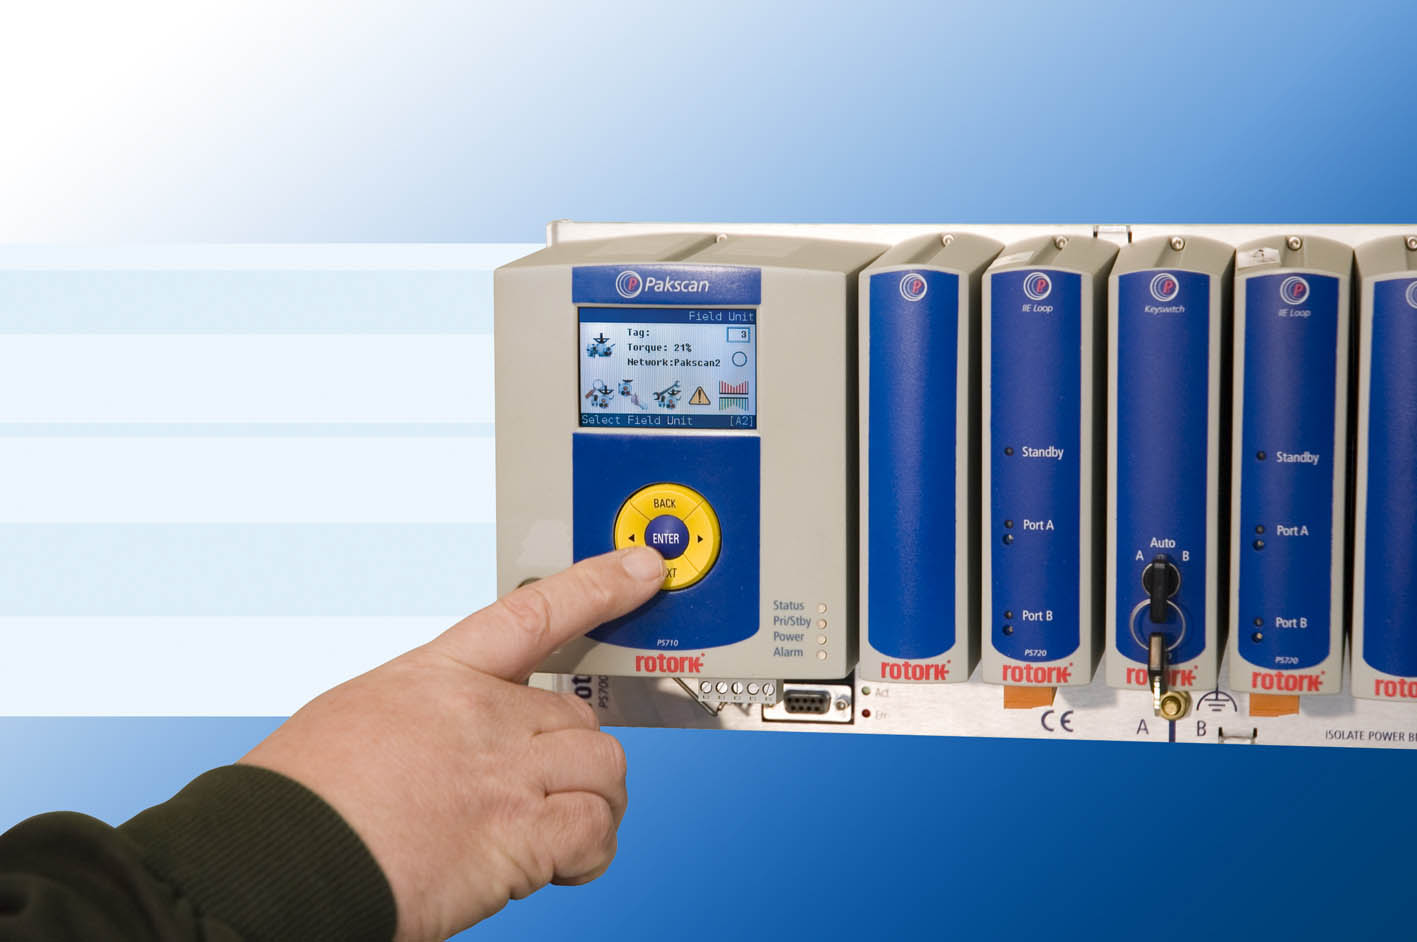 Rotork launches Pakscan P3 digital control for valve actuators